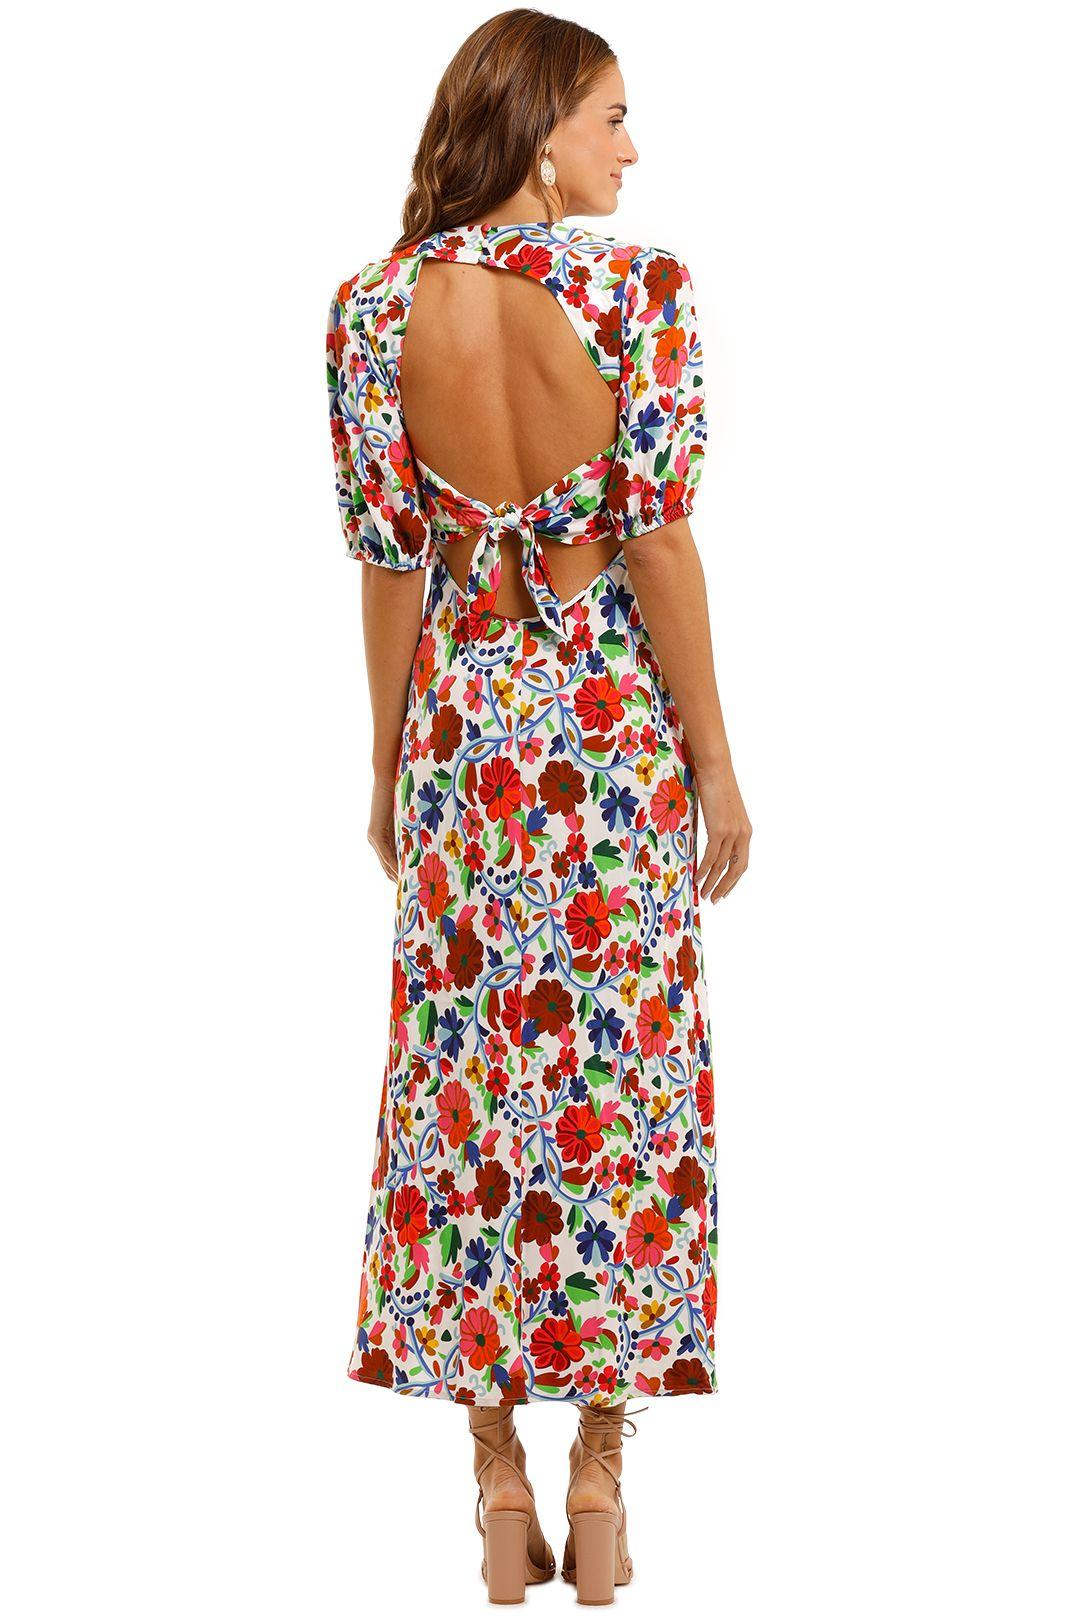 Rixo London Steph Crepe Midi Dress Backless